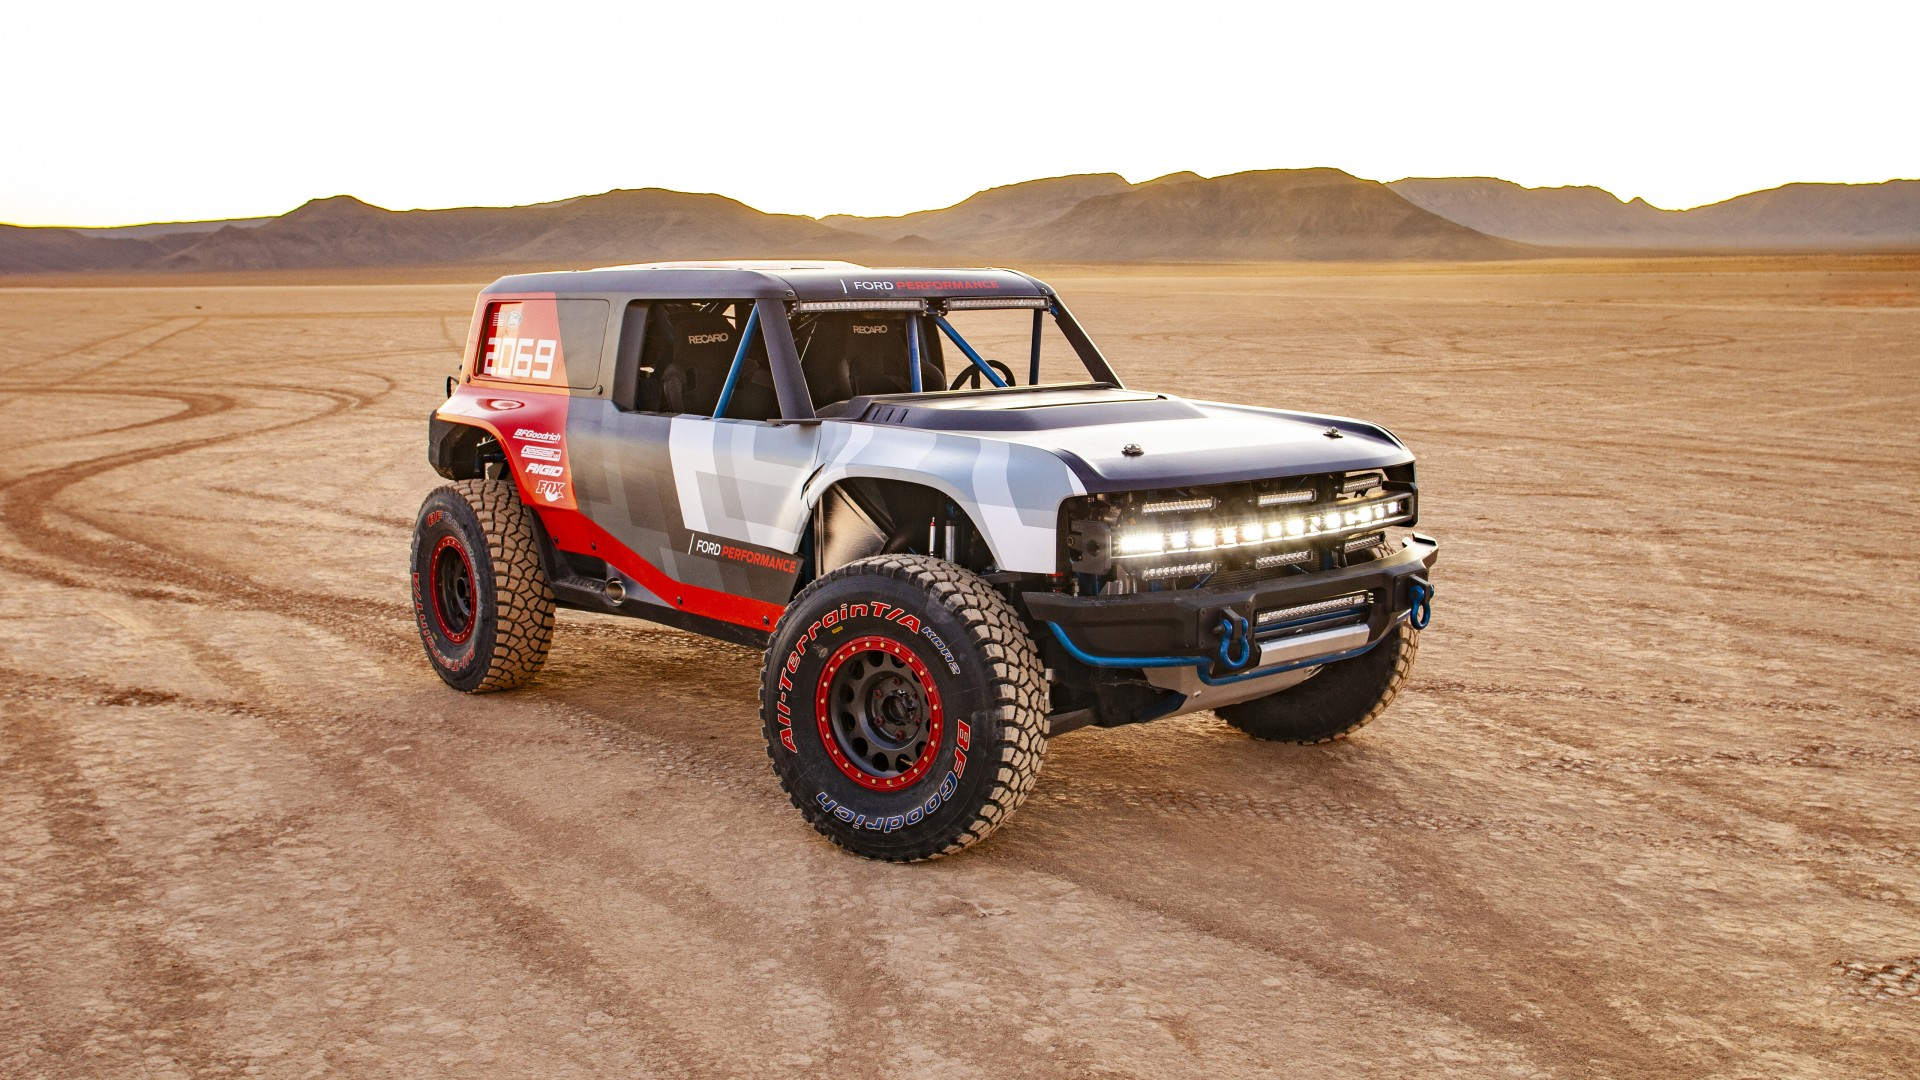 Ford Bronco R Race Prototype 2019 4K Wallpaper | HD Car ...